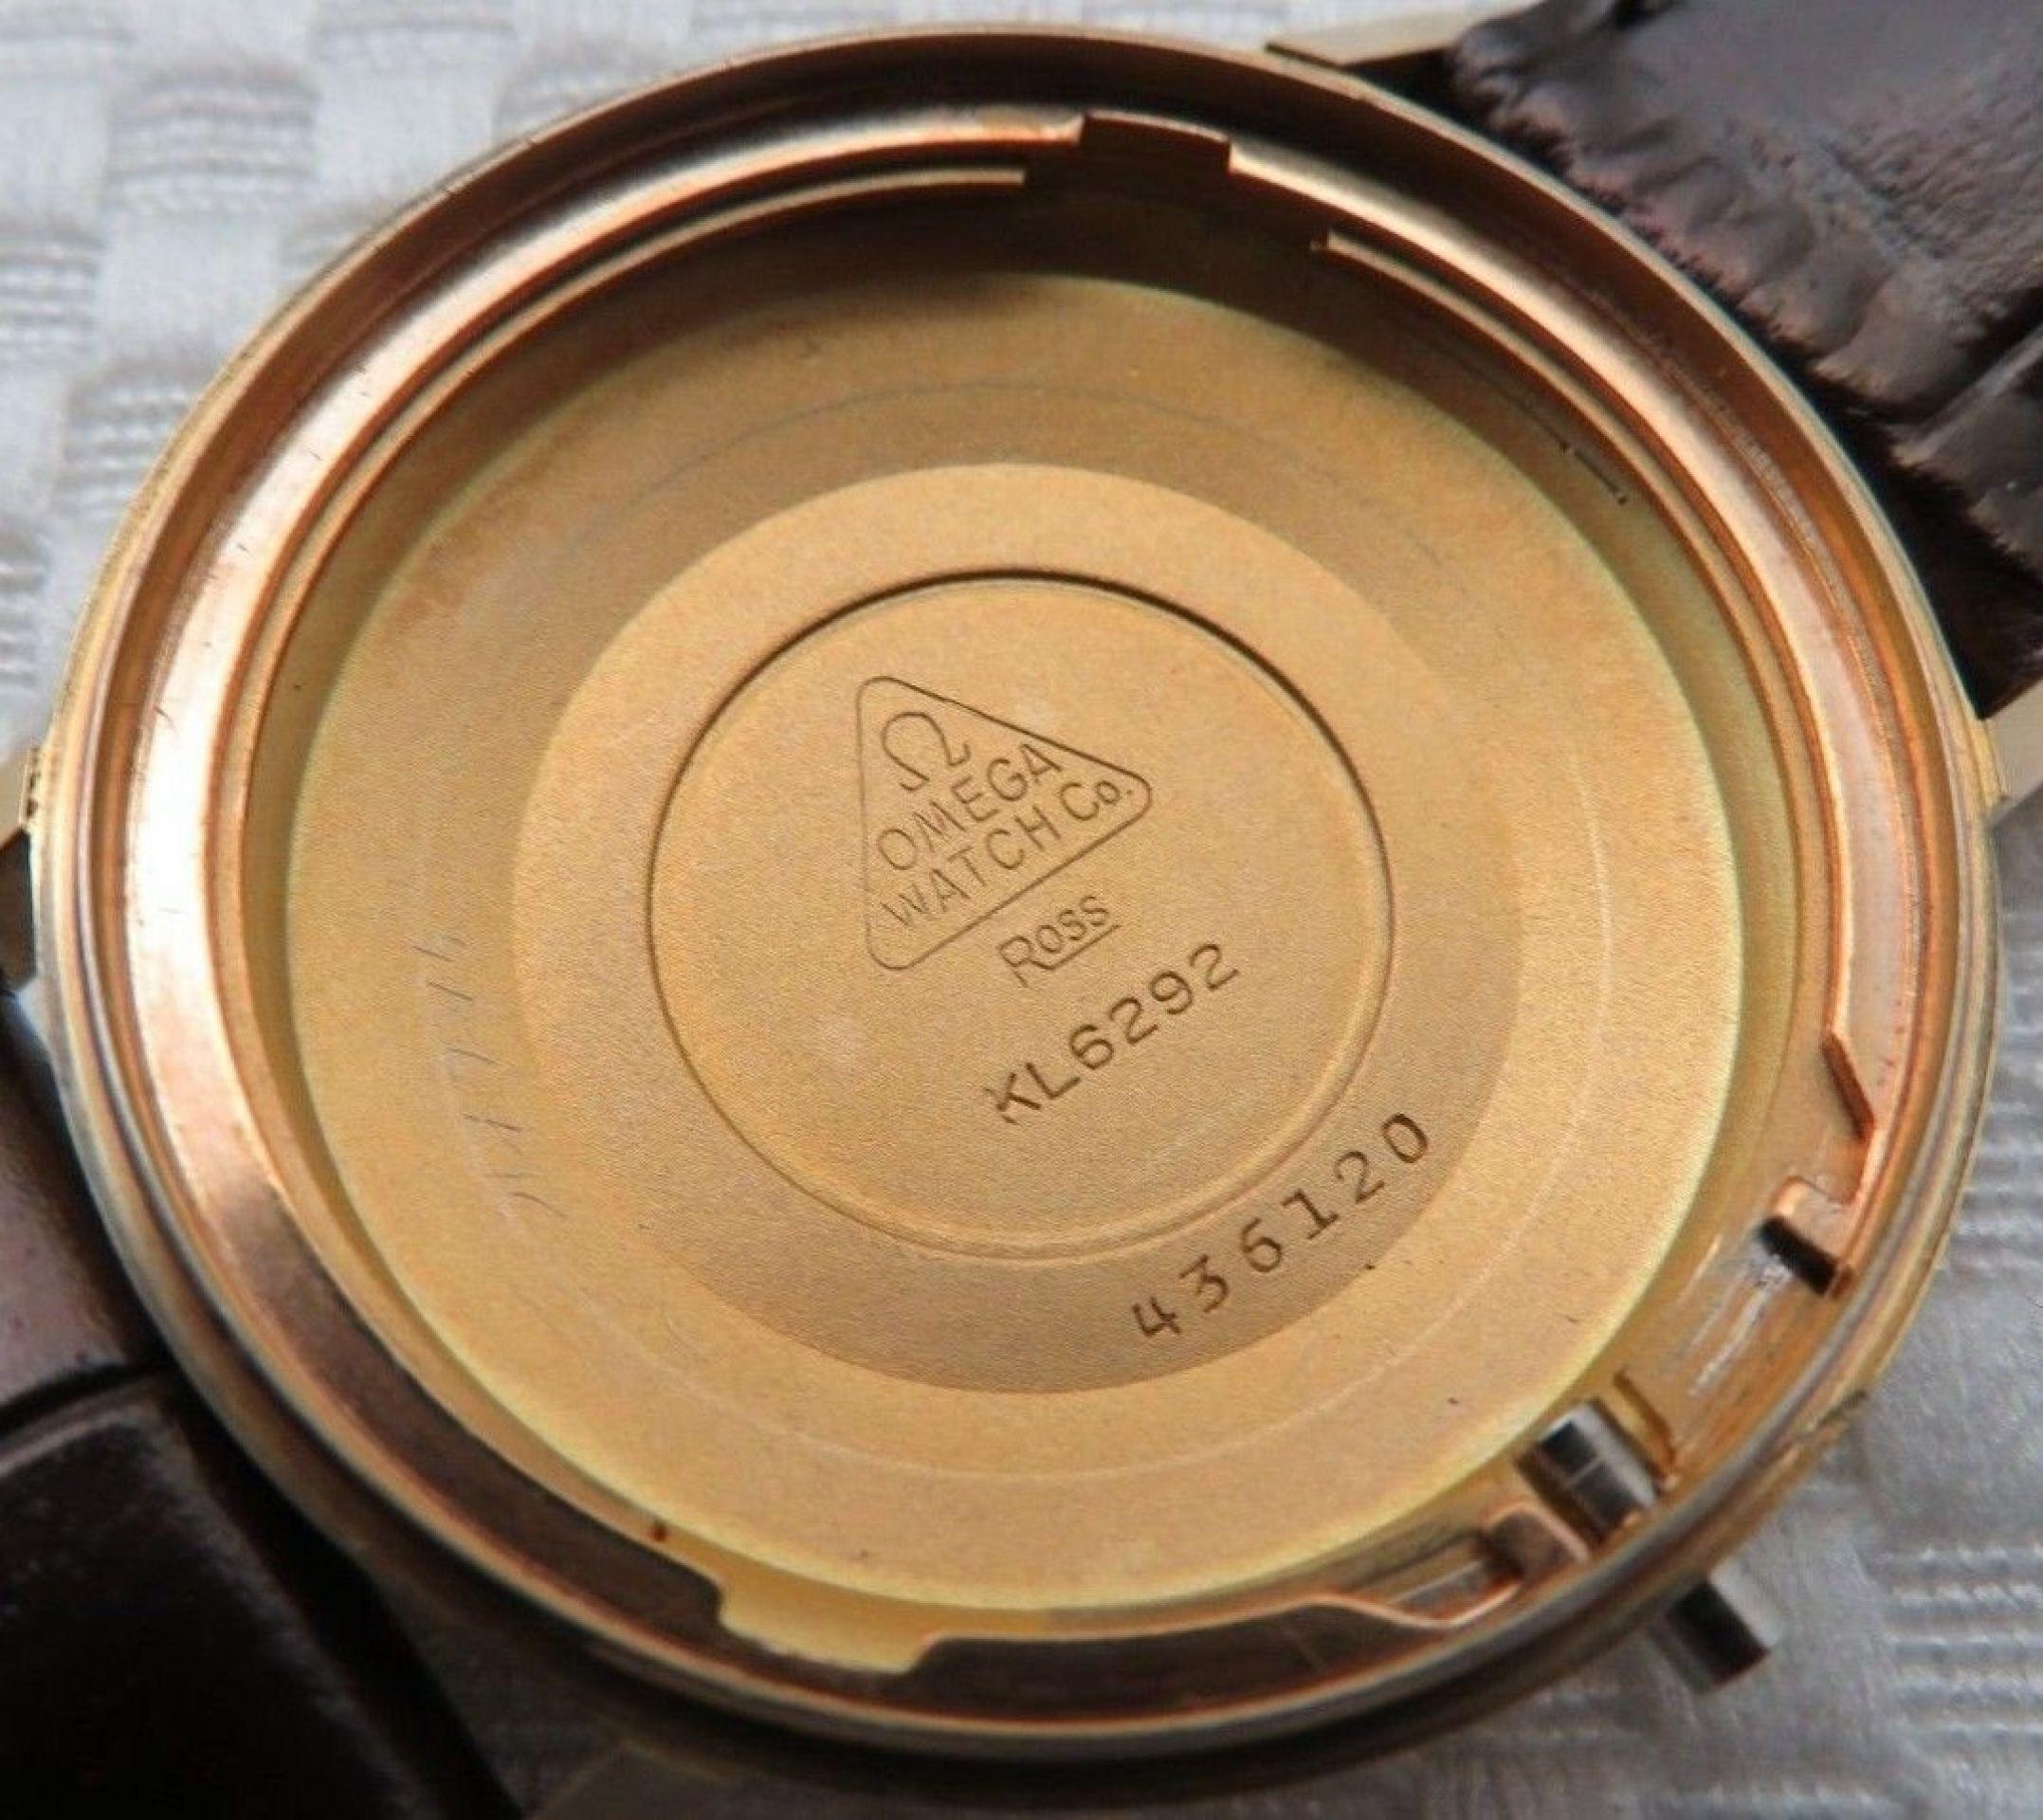 OMEGA SEAMASTER DE VILLE CROSSHAIR DIAL VINTAGE WATCH CAL 560 AUTOMATIC